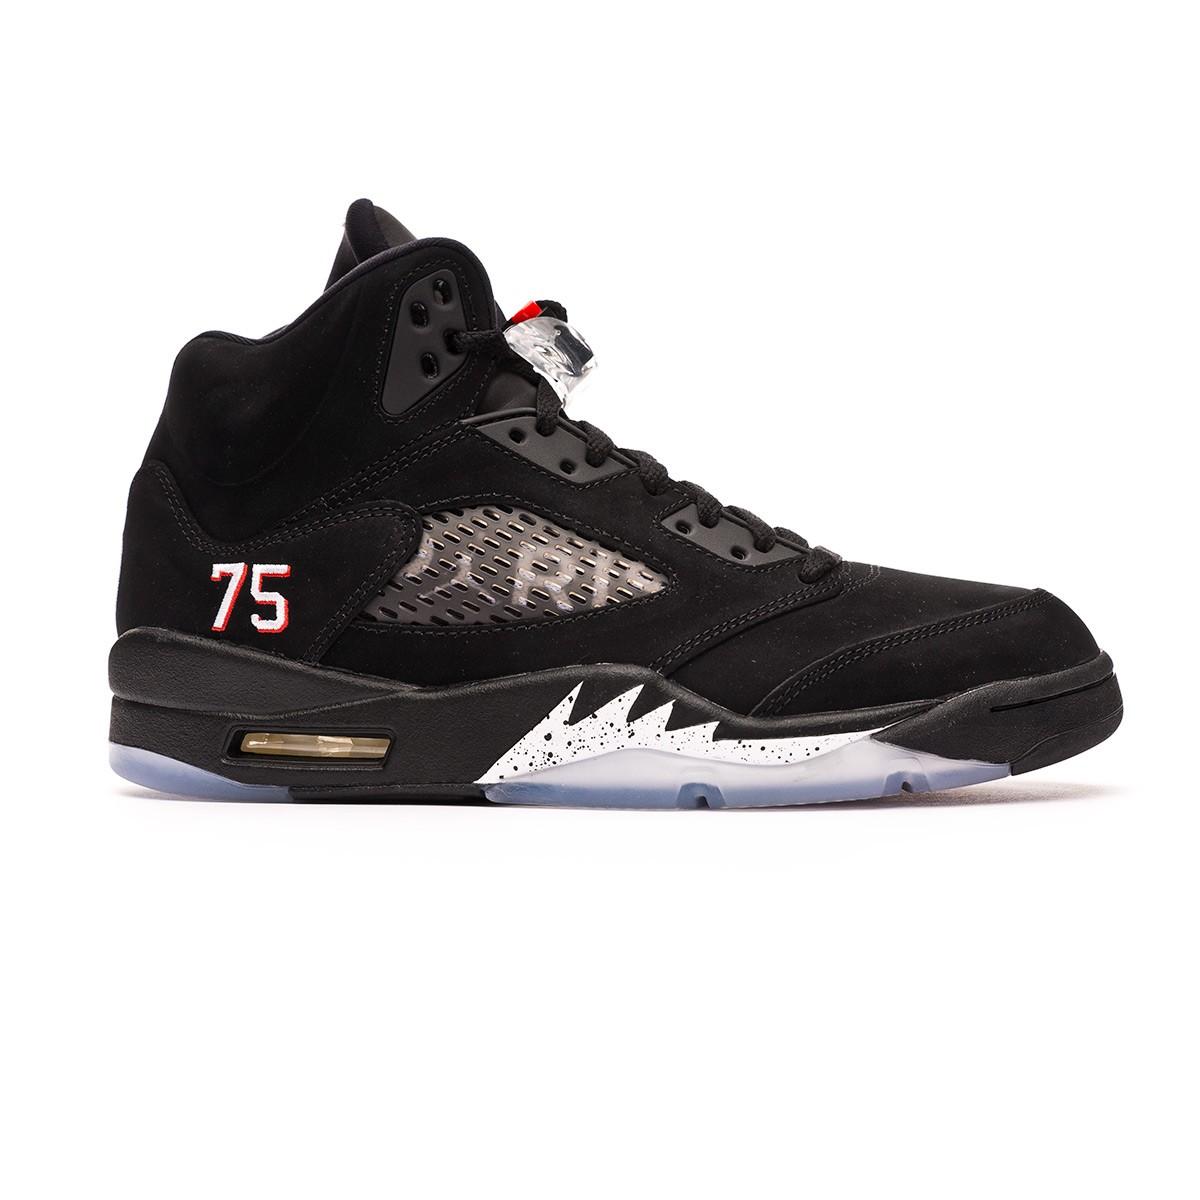 5263fafd5a5 Trainers Nike Air Jordan 5 Retro Jordan x PSG Black-Challenge red-White -  Tienda de fútbol Fútbol Emotion